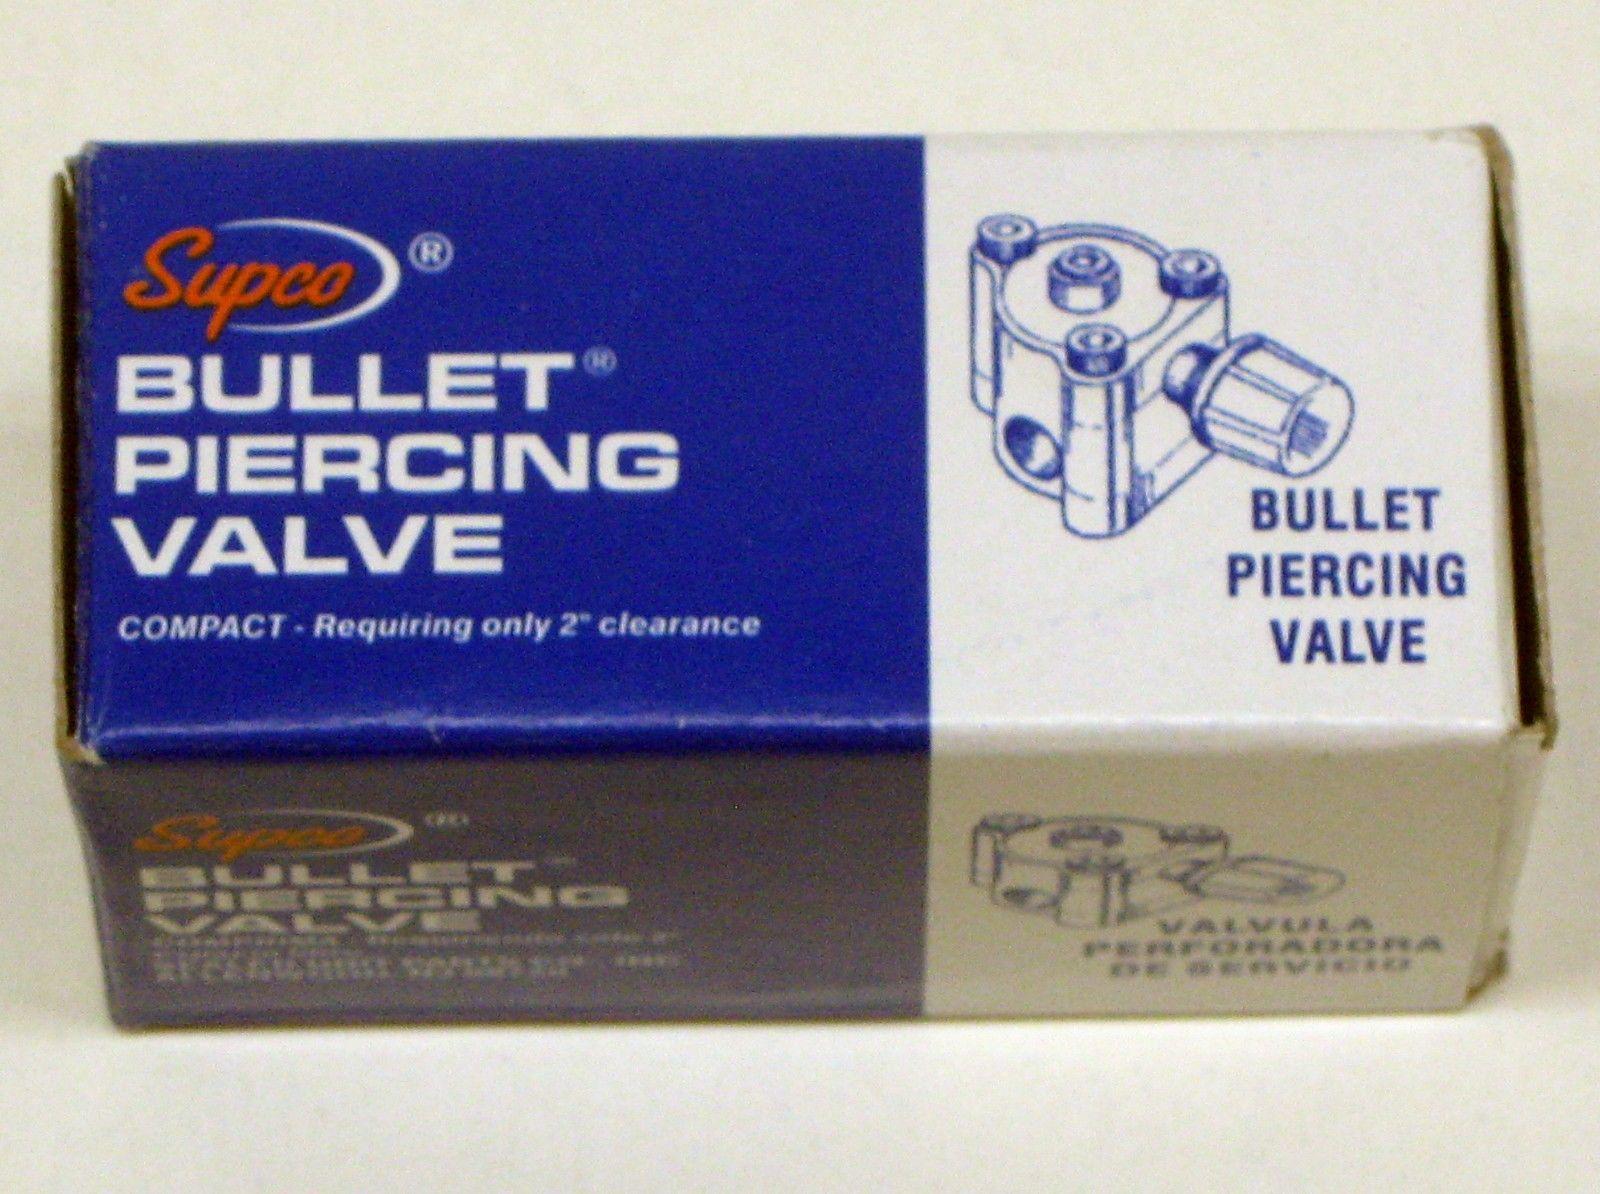 Supco Bullet Piercing Valve